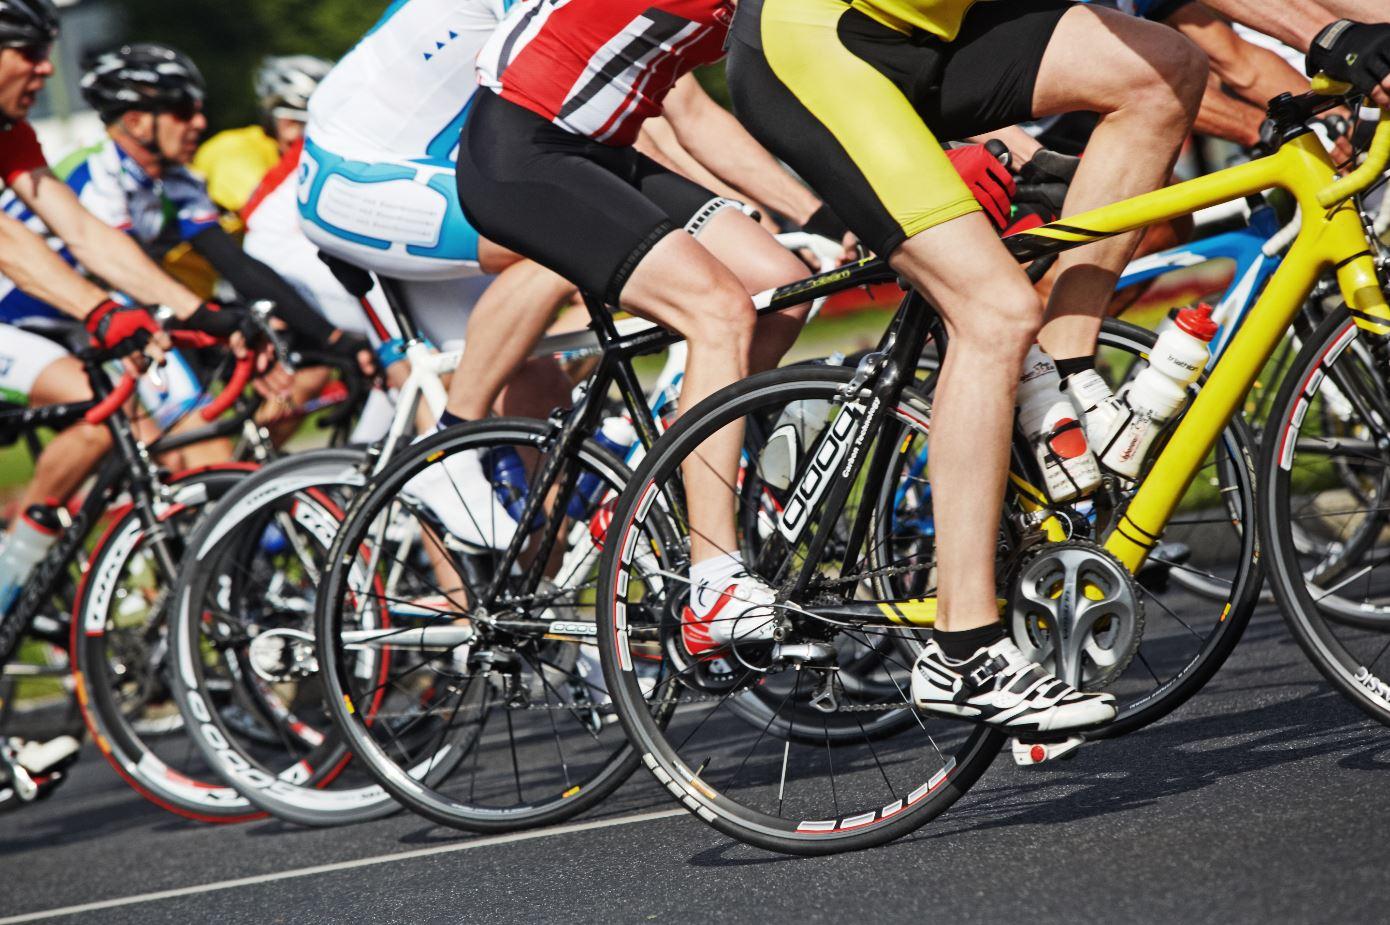 Fahrradbekleidung - der Unterkörper: guter Sitz, gutes Polster!